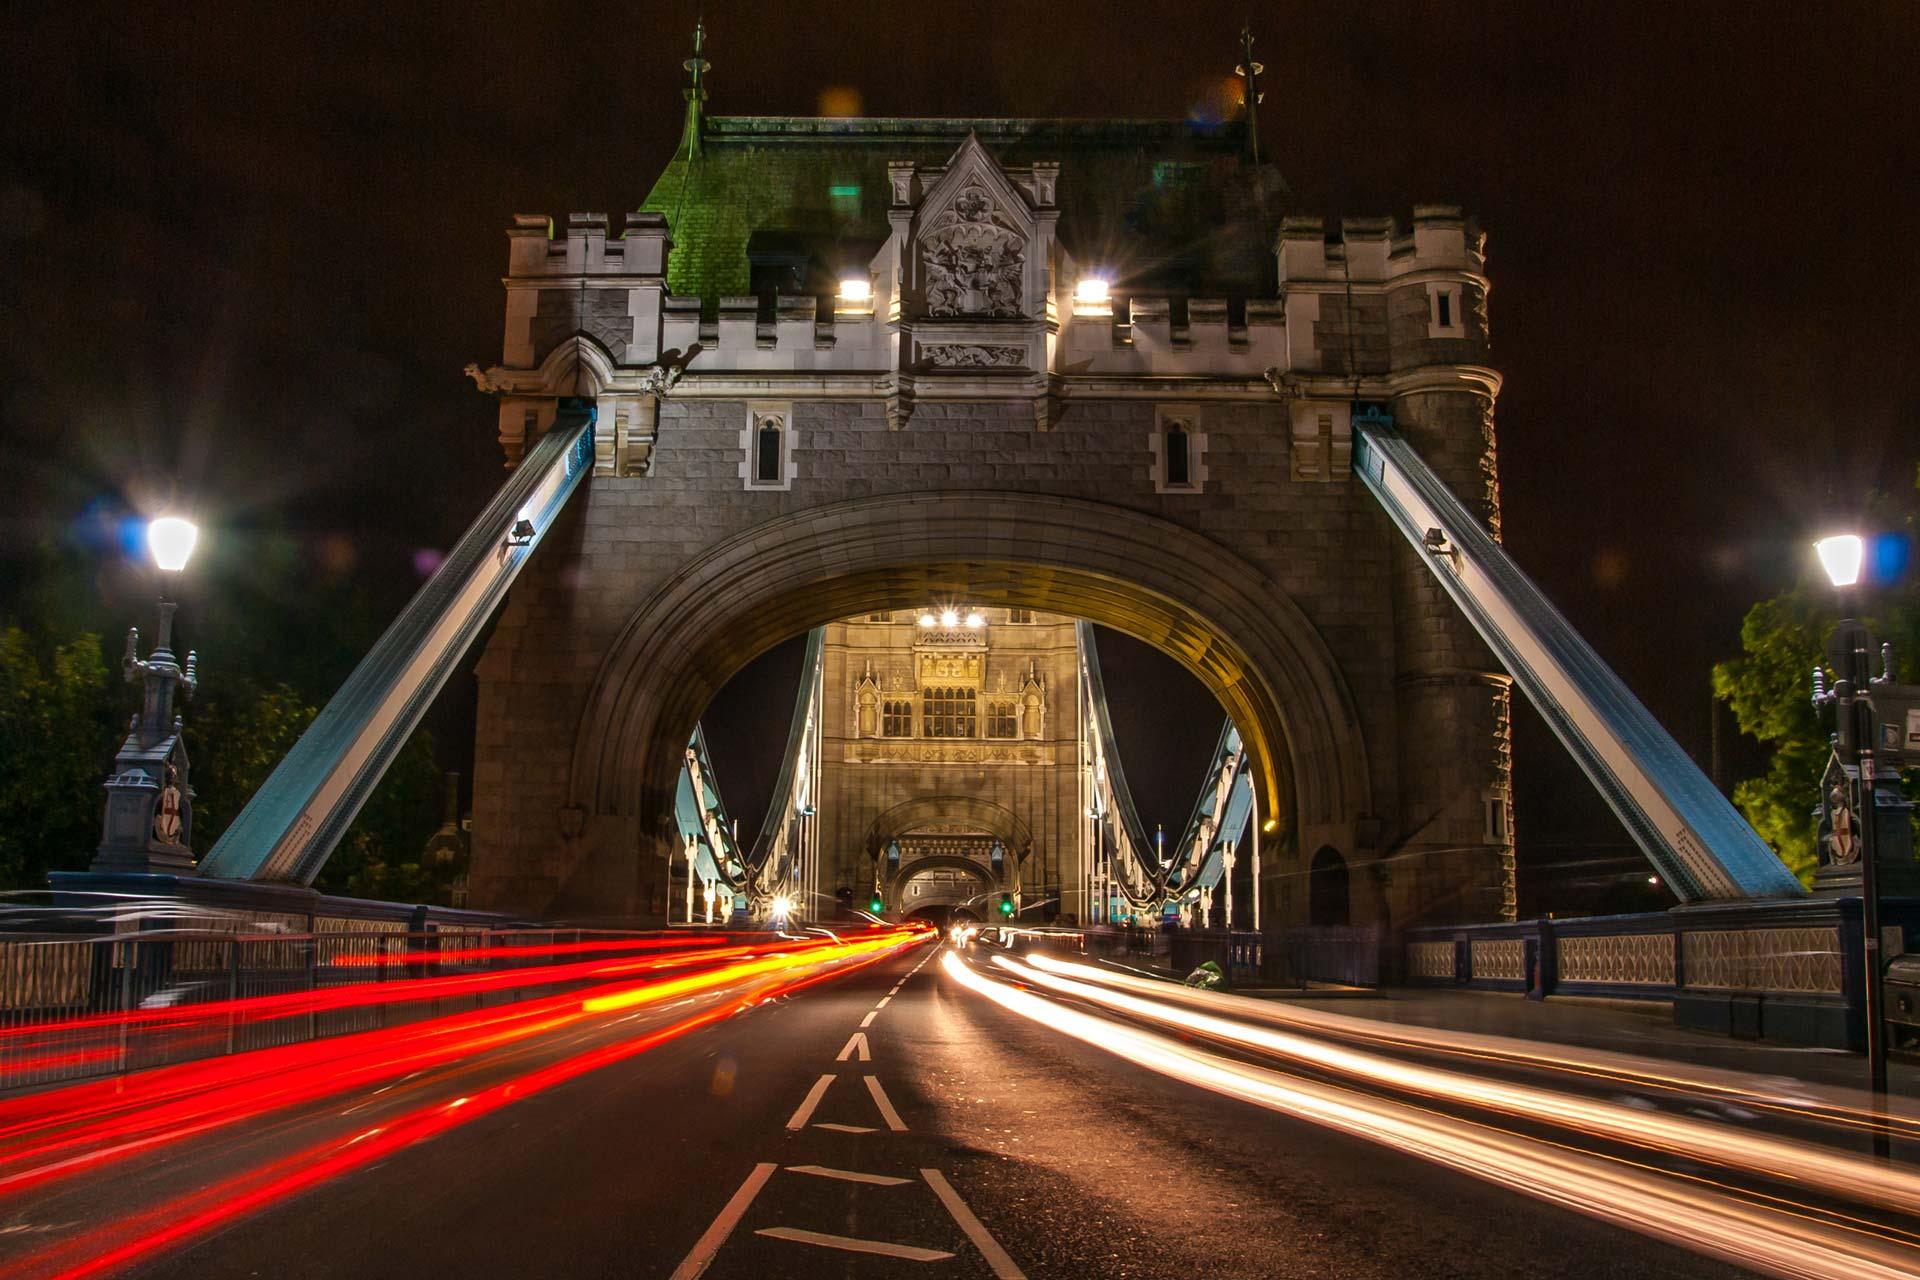 Nachtfotografie - Towerbridge